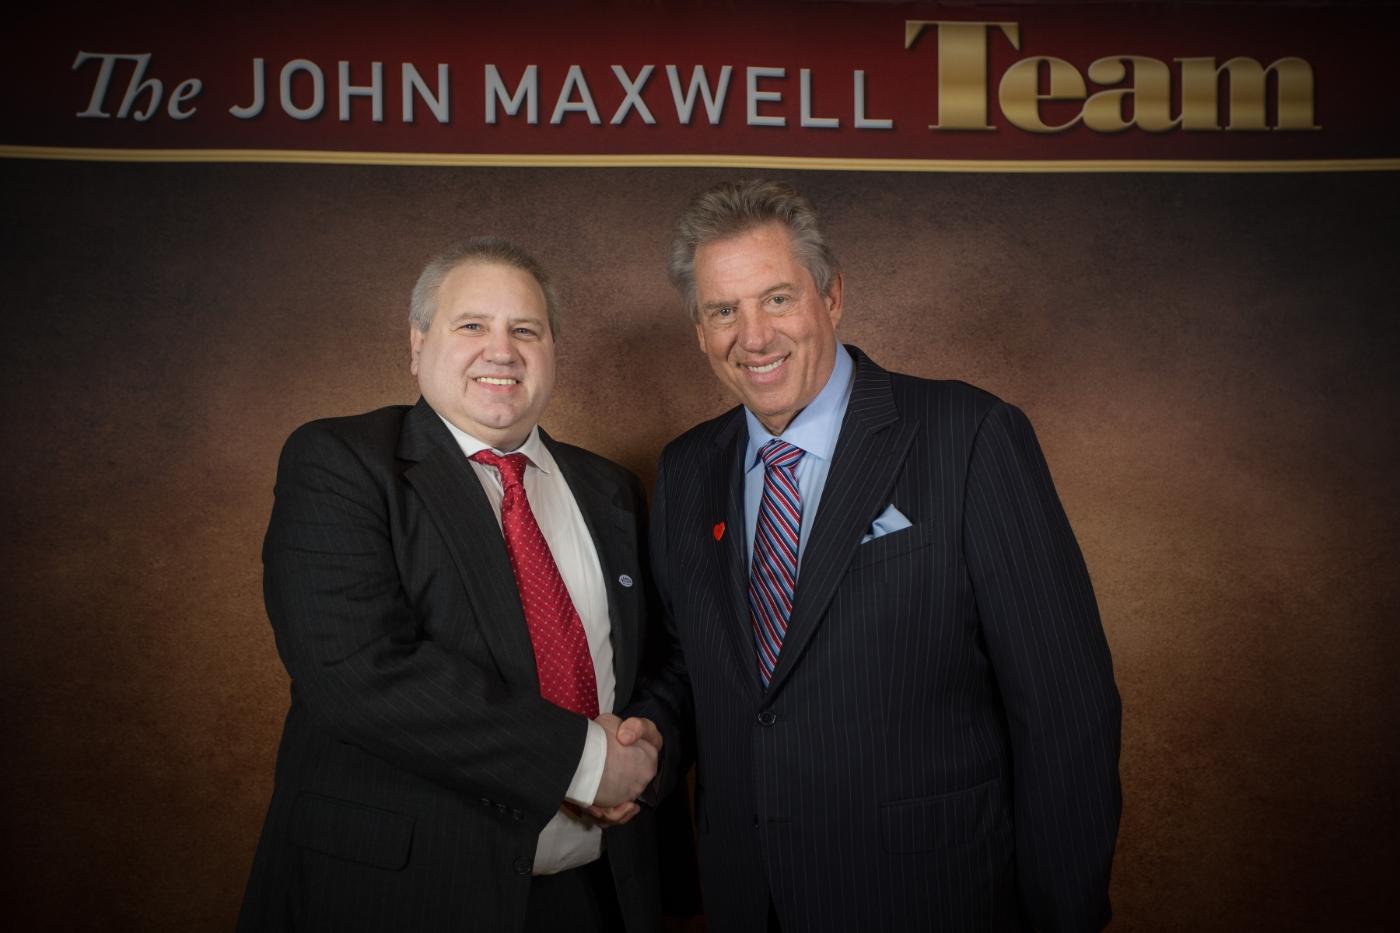 The John Maxwell Team Executive Director Jay Olivo's Meetup